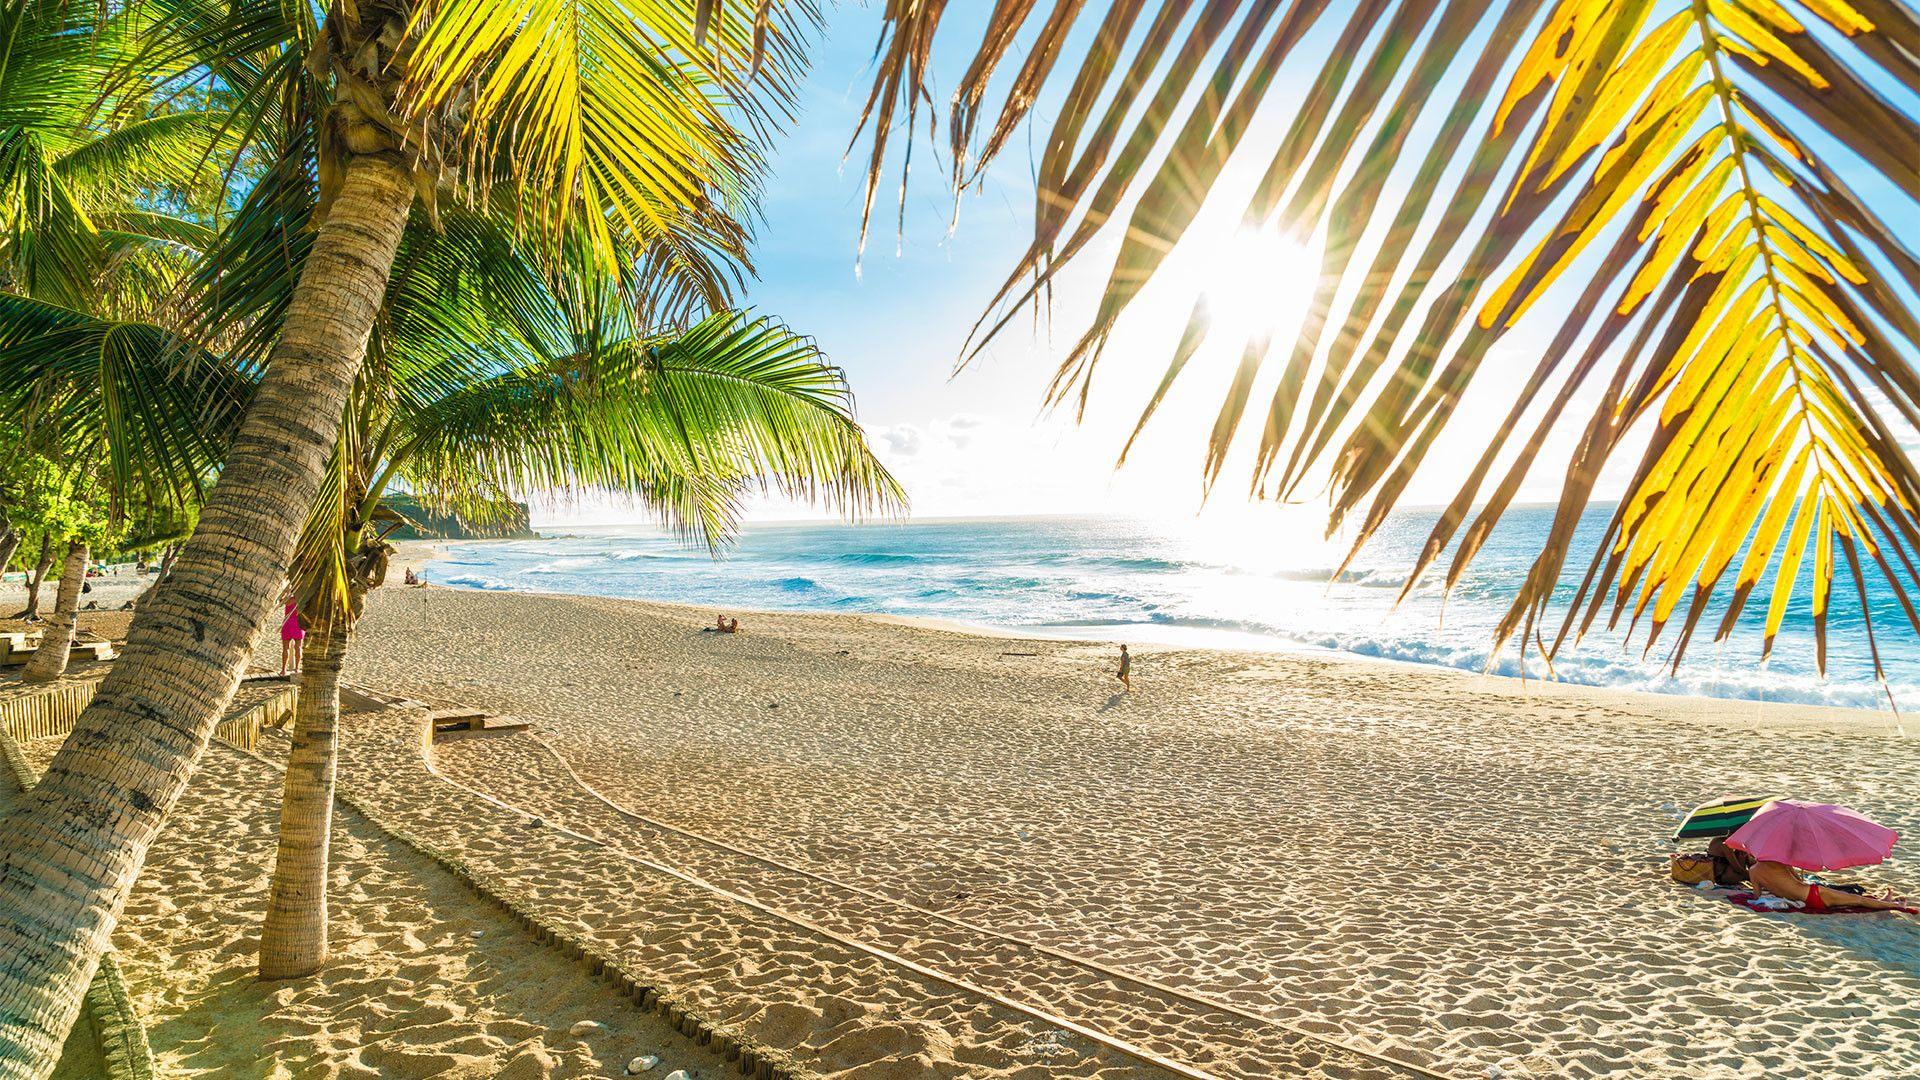 Revelion 2022 - Sejur plaja Reunion, 11 zile